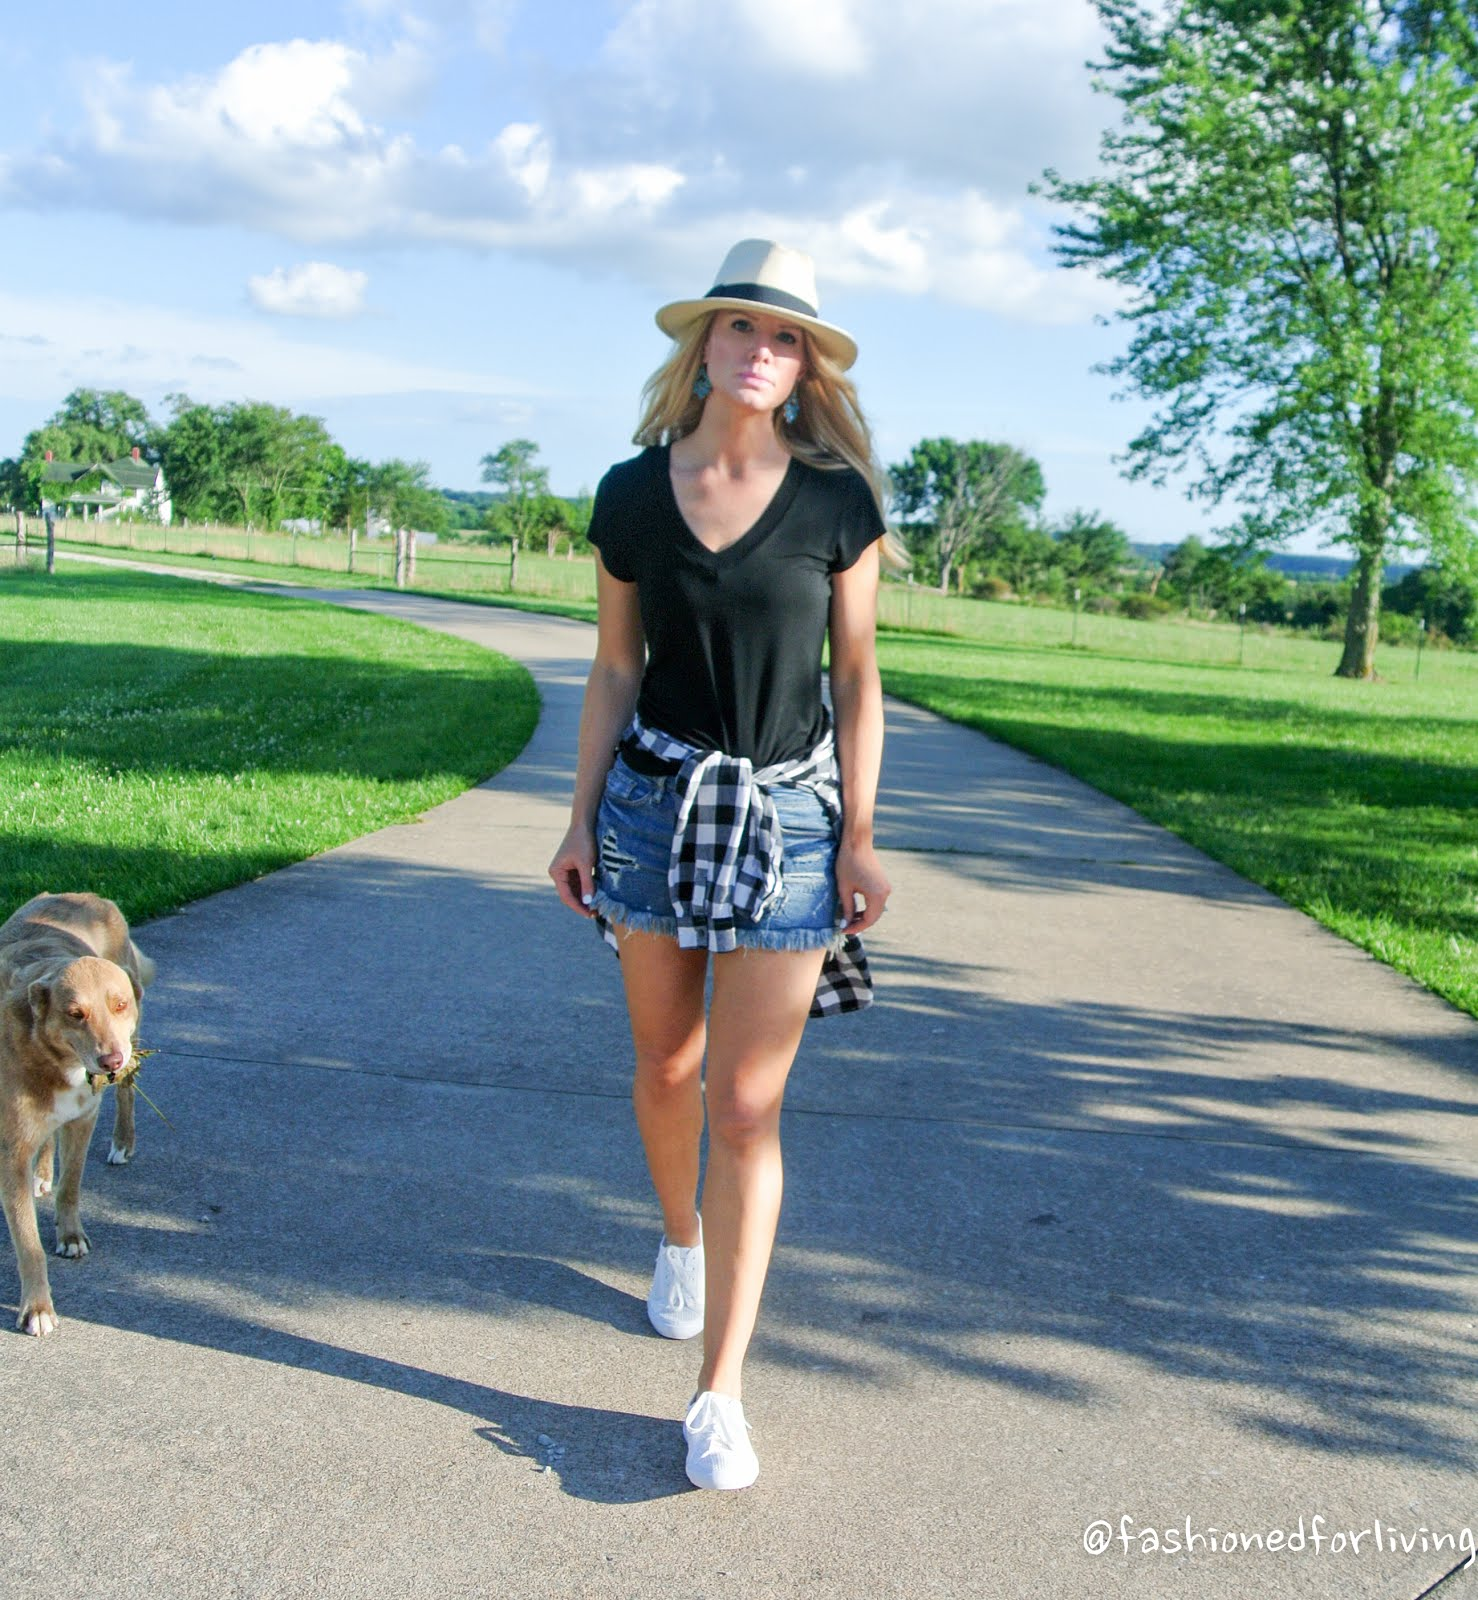 denim cutoffs. black and white flannel. pananama hat. black and white outfit. cutoff shorts outfit.-31